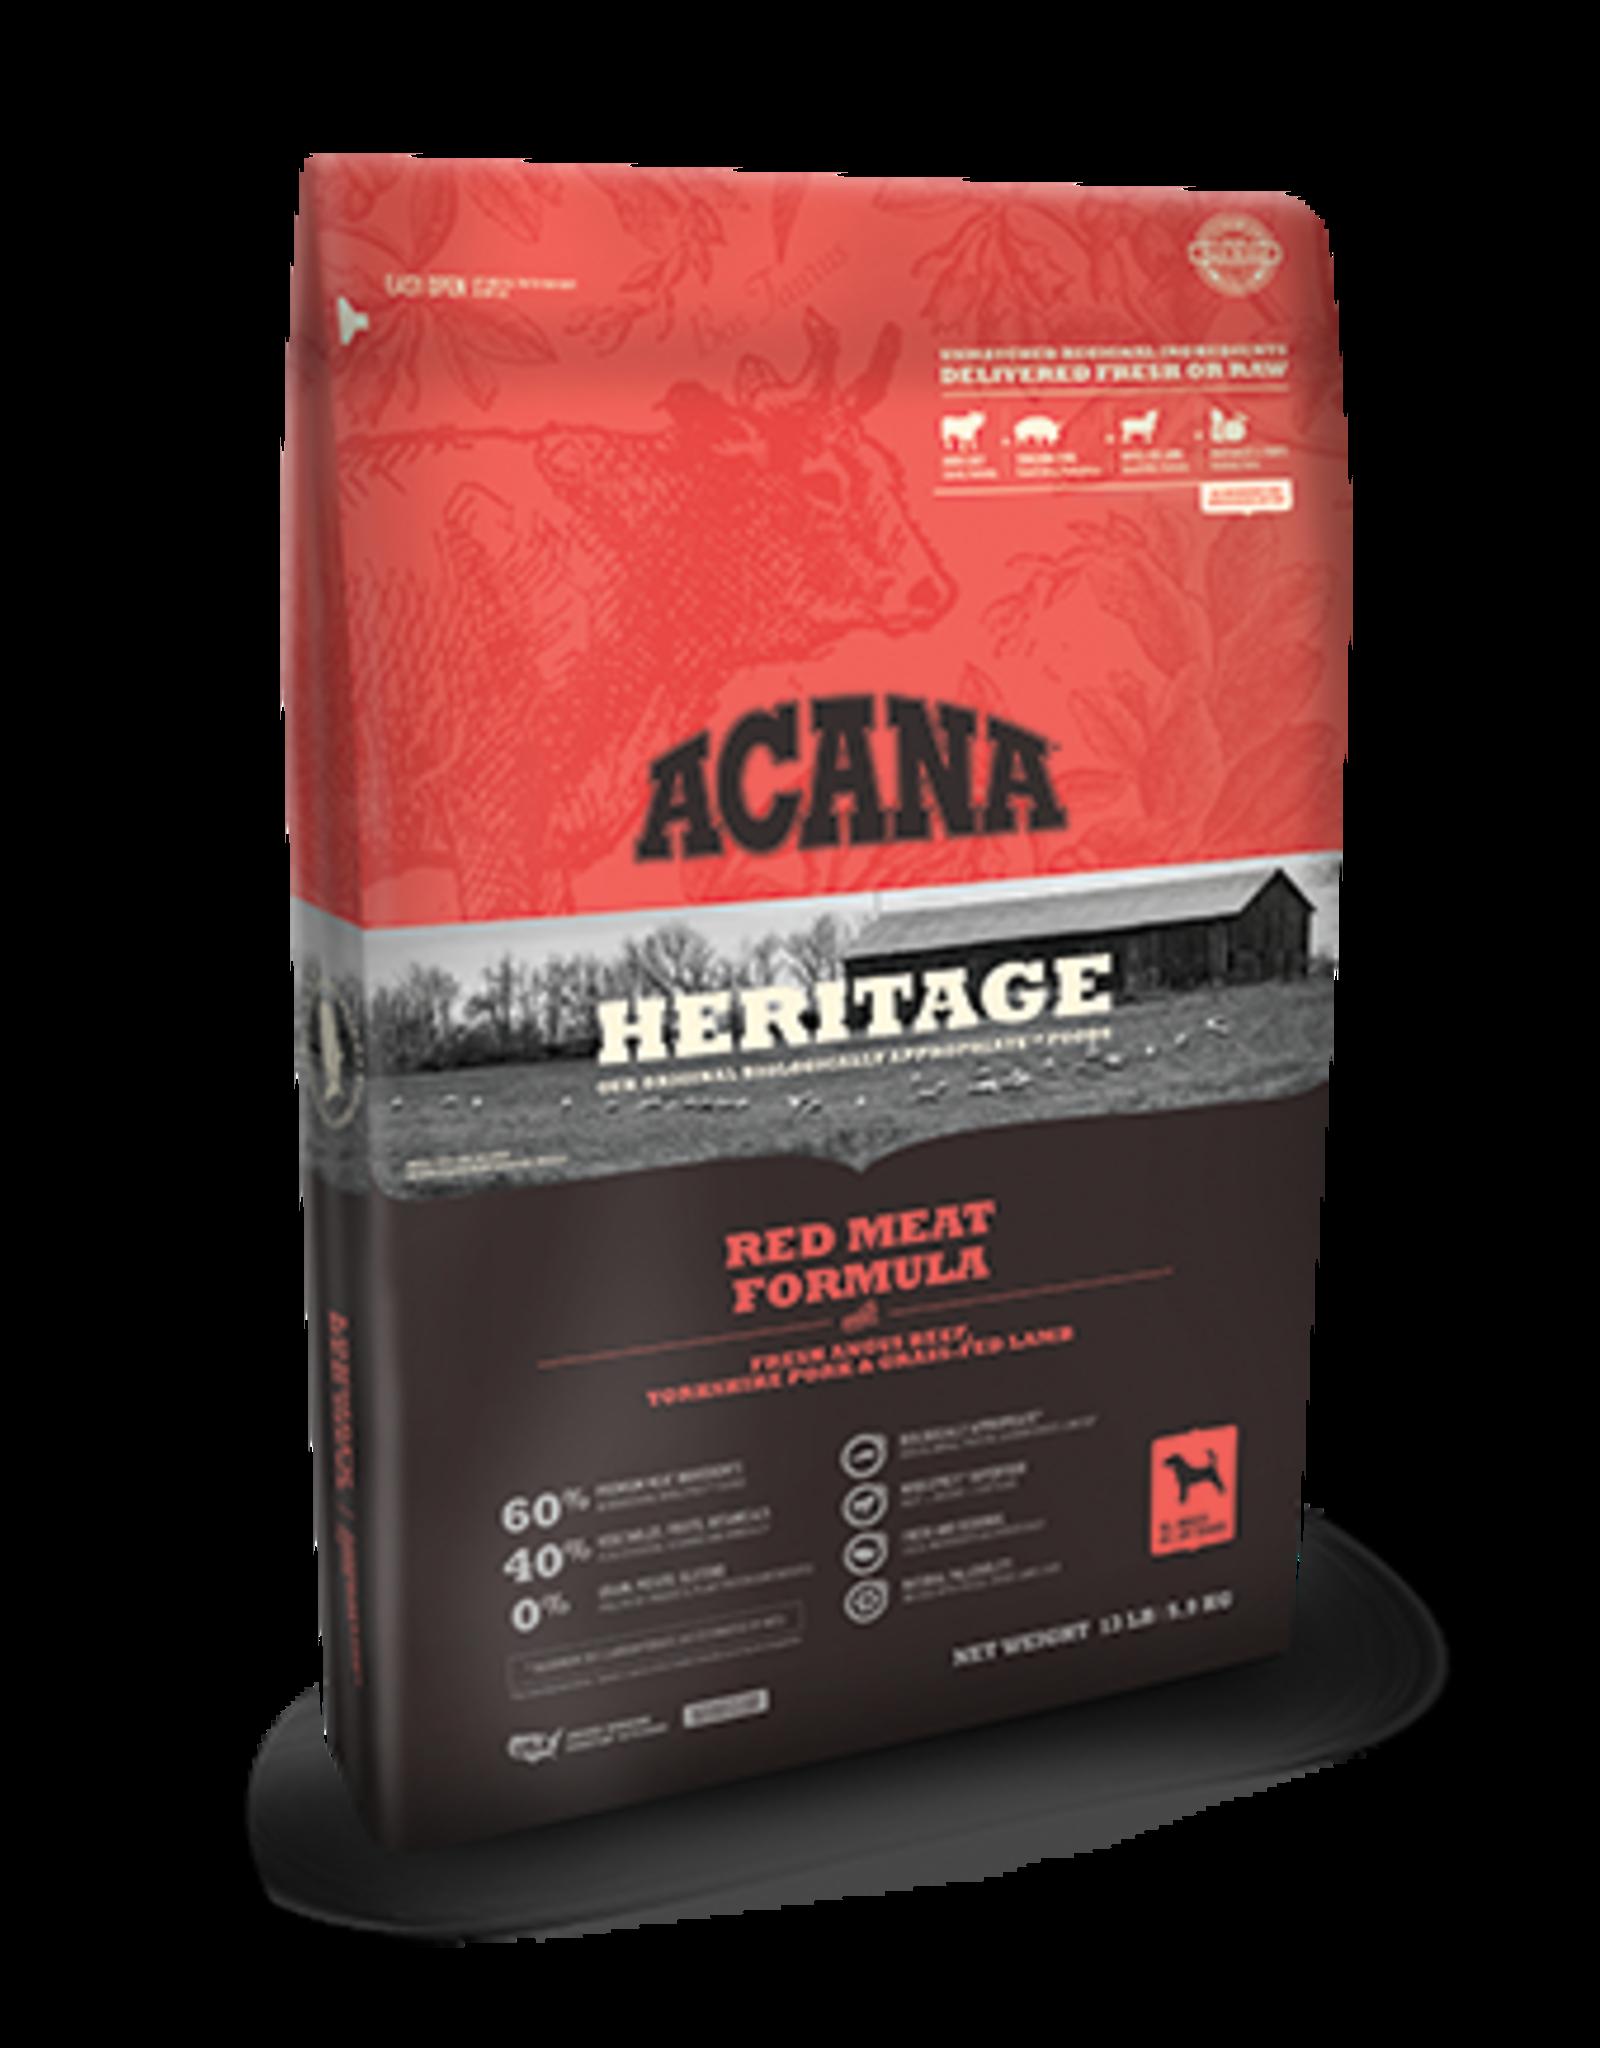 Acana Acana Heritage Dog Food Red Meats